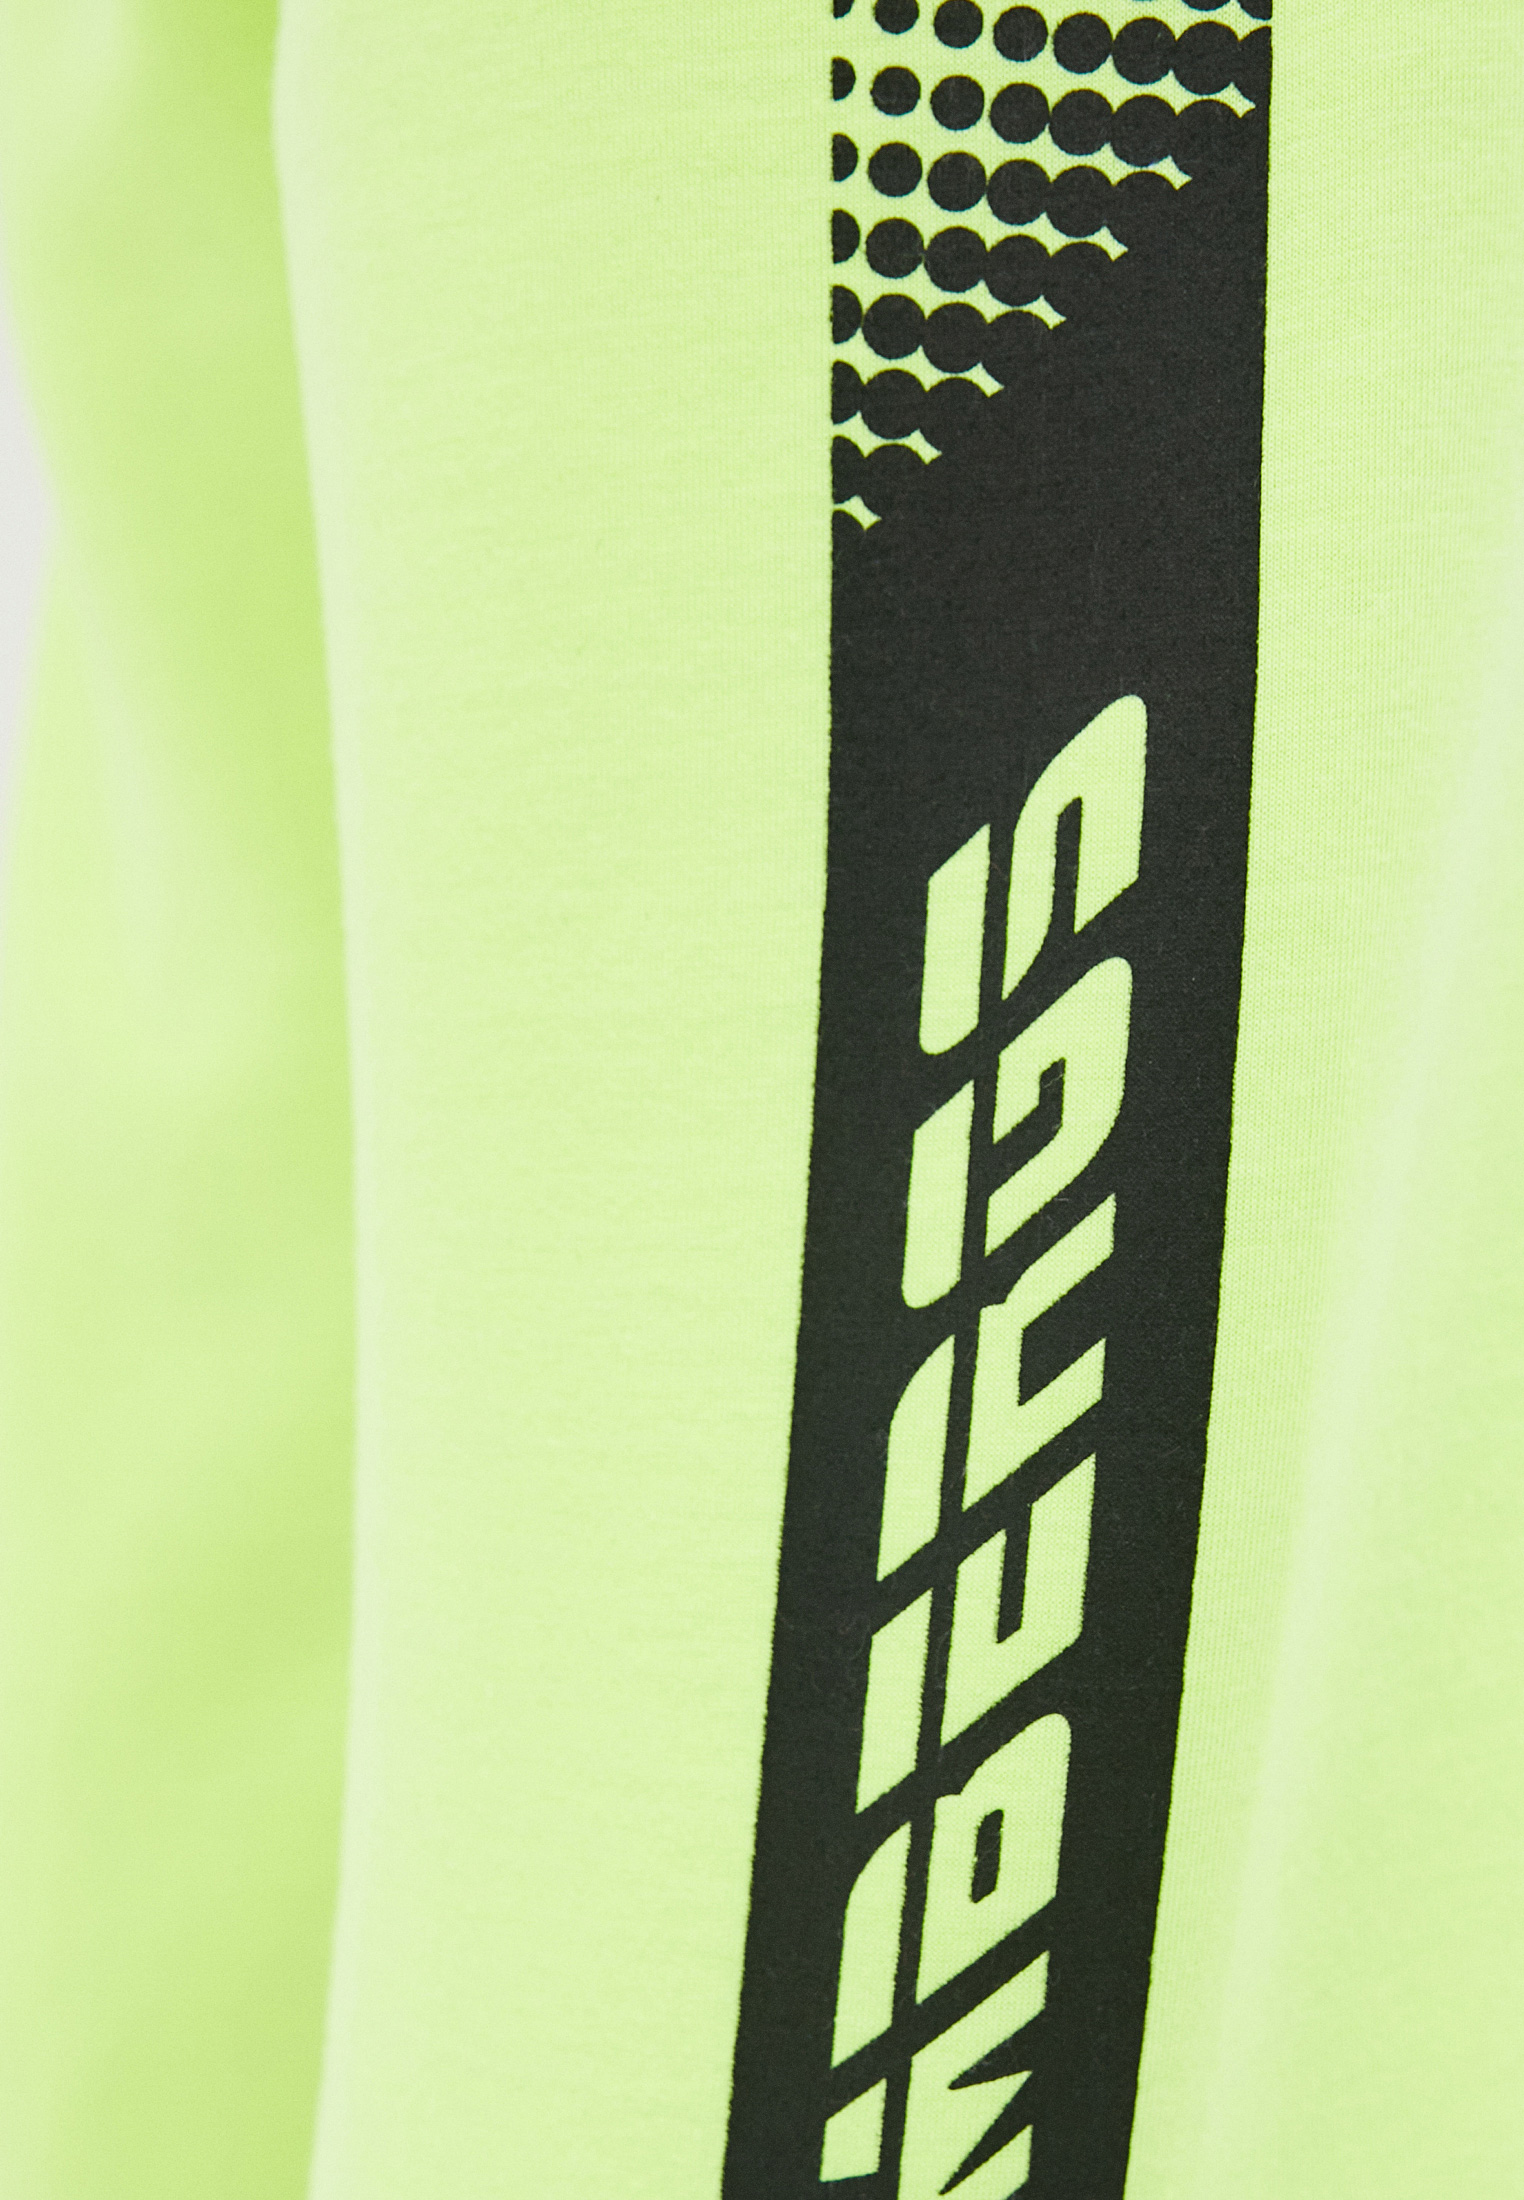 Мужские спортивные брюки Bikkembergs (Биккембергс) C 1 096 9E M 4119: изображение 5